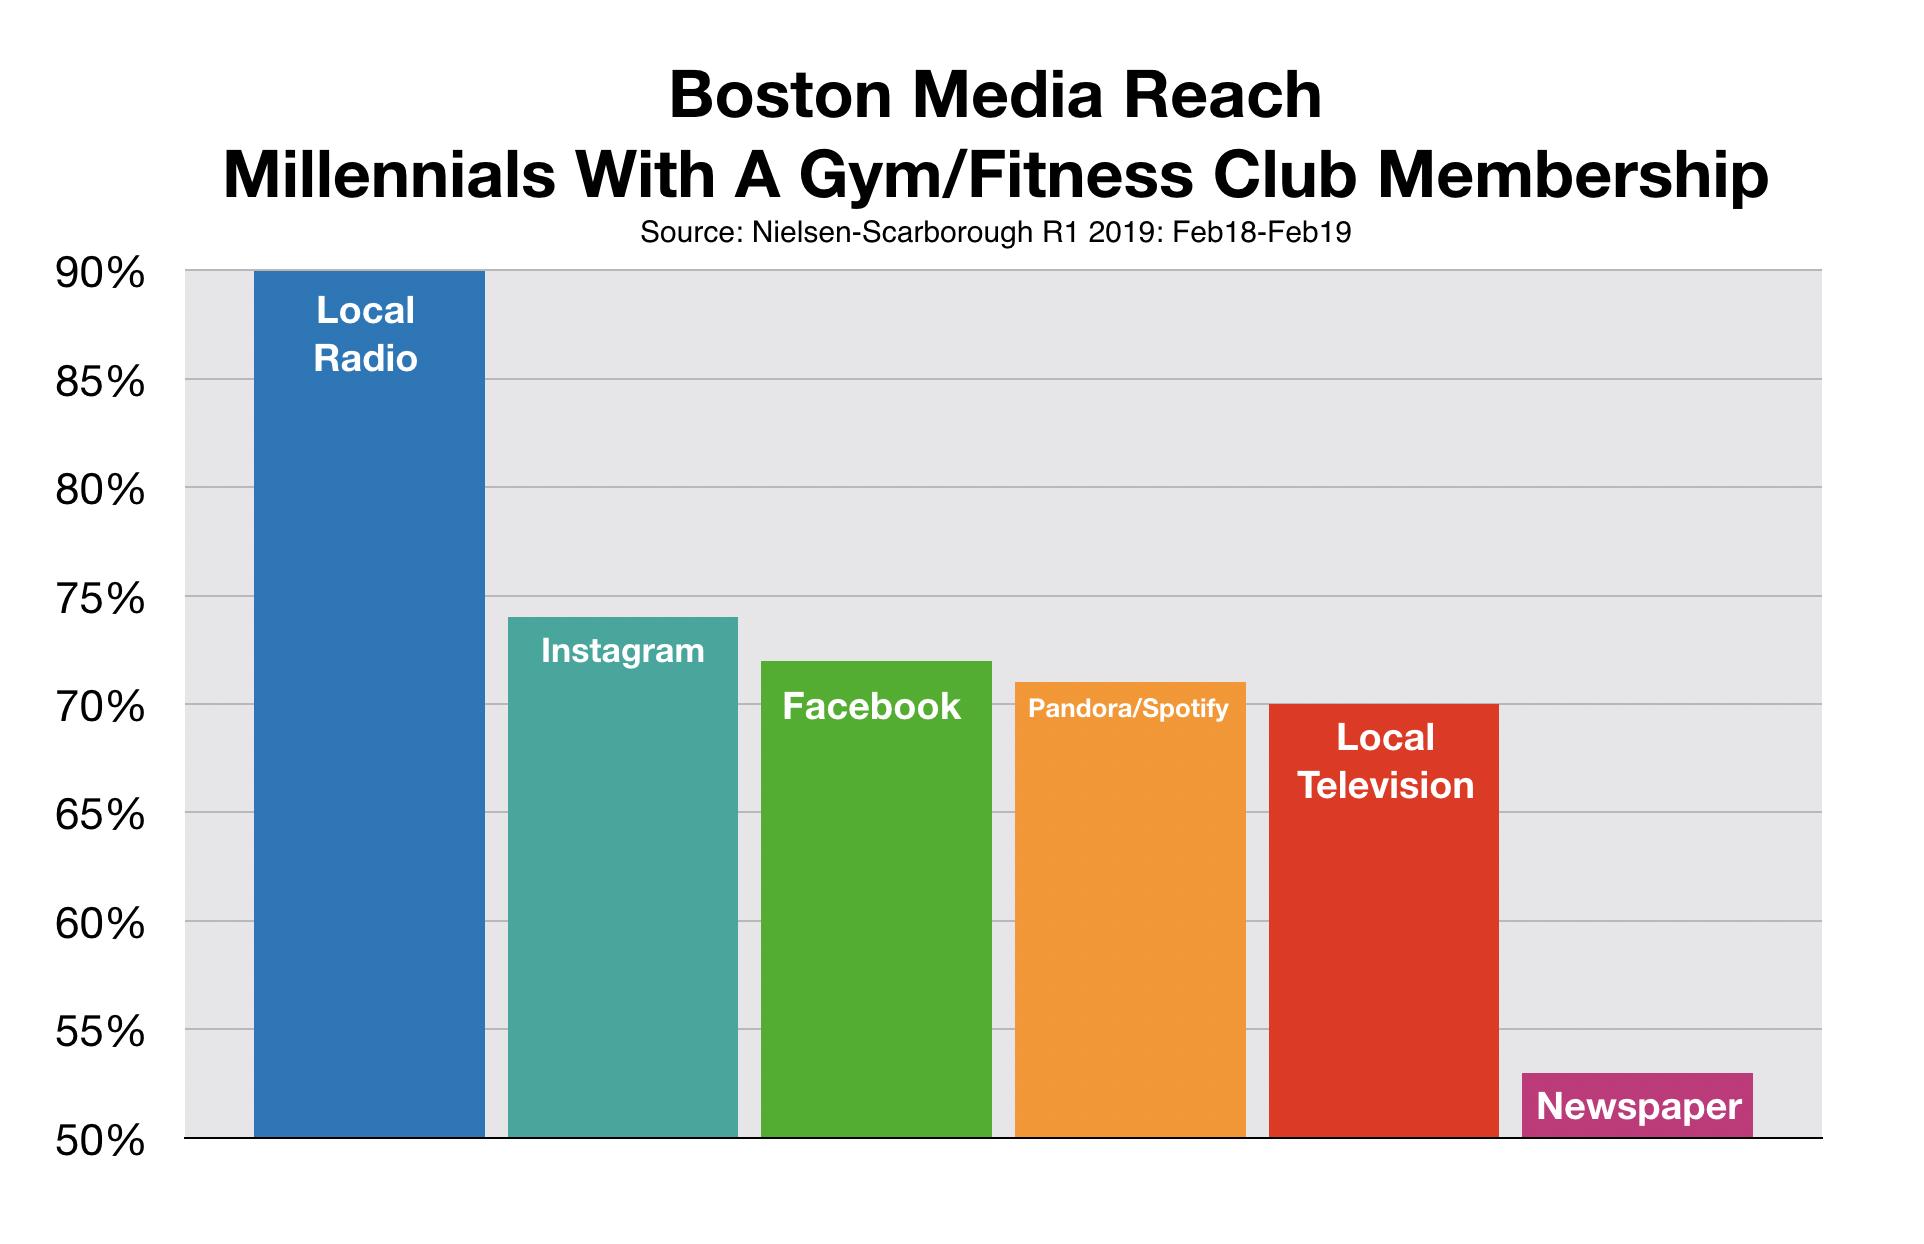 Advertise To Millennials in Boston Gym Memberships